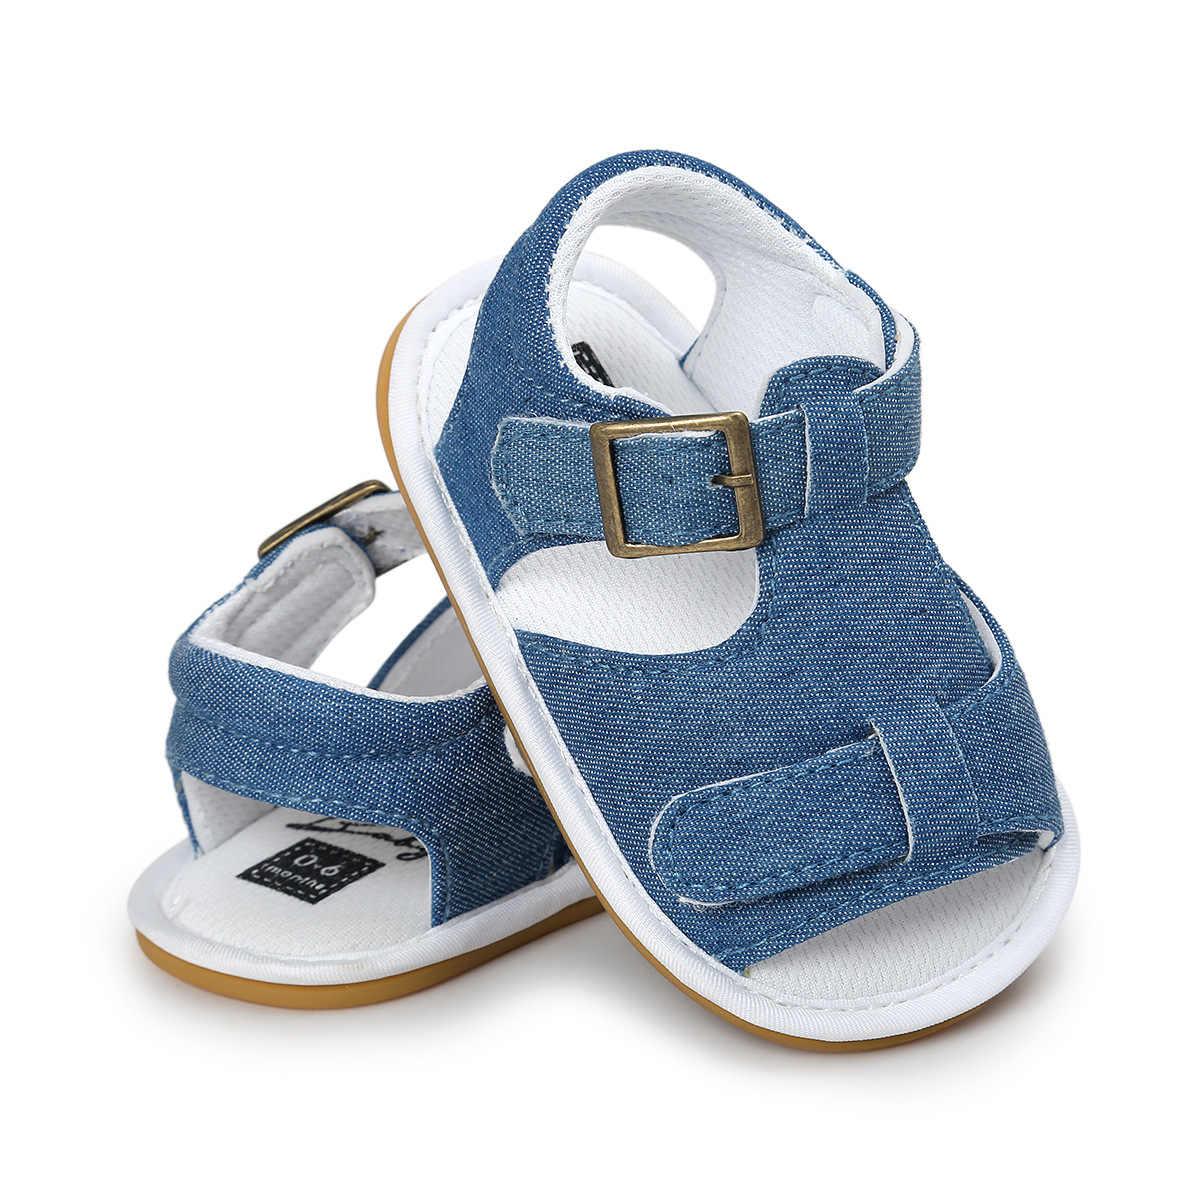 2019 Summer 0 18M Baby Boys Sandals